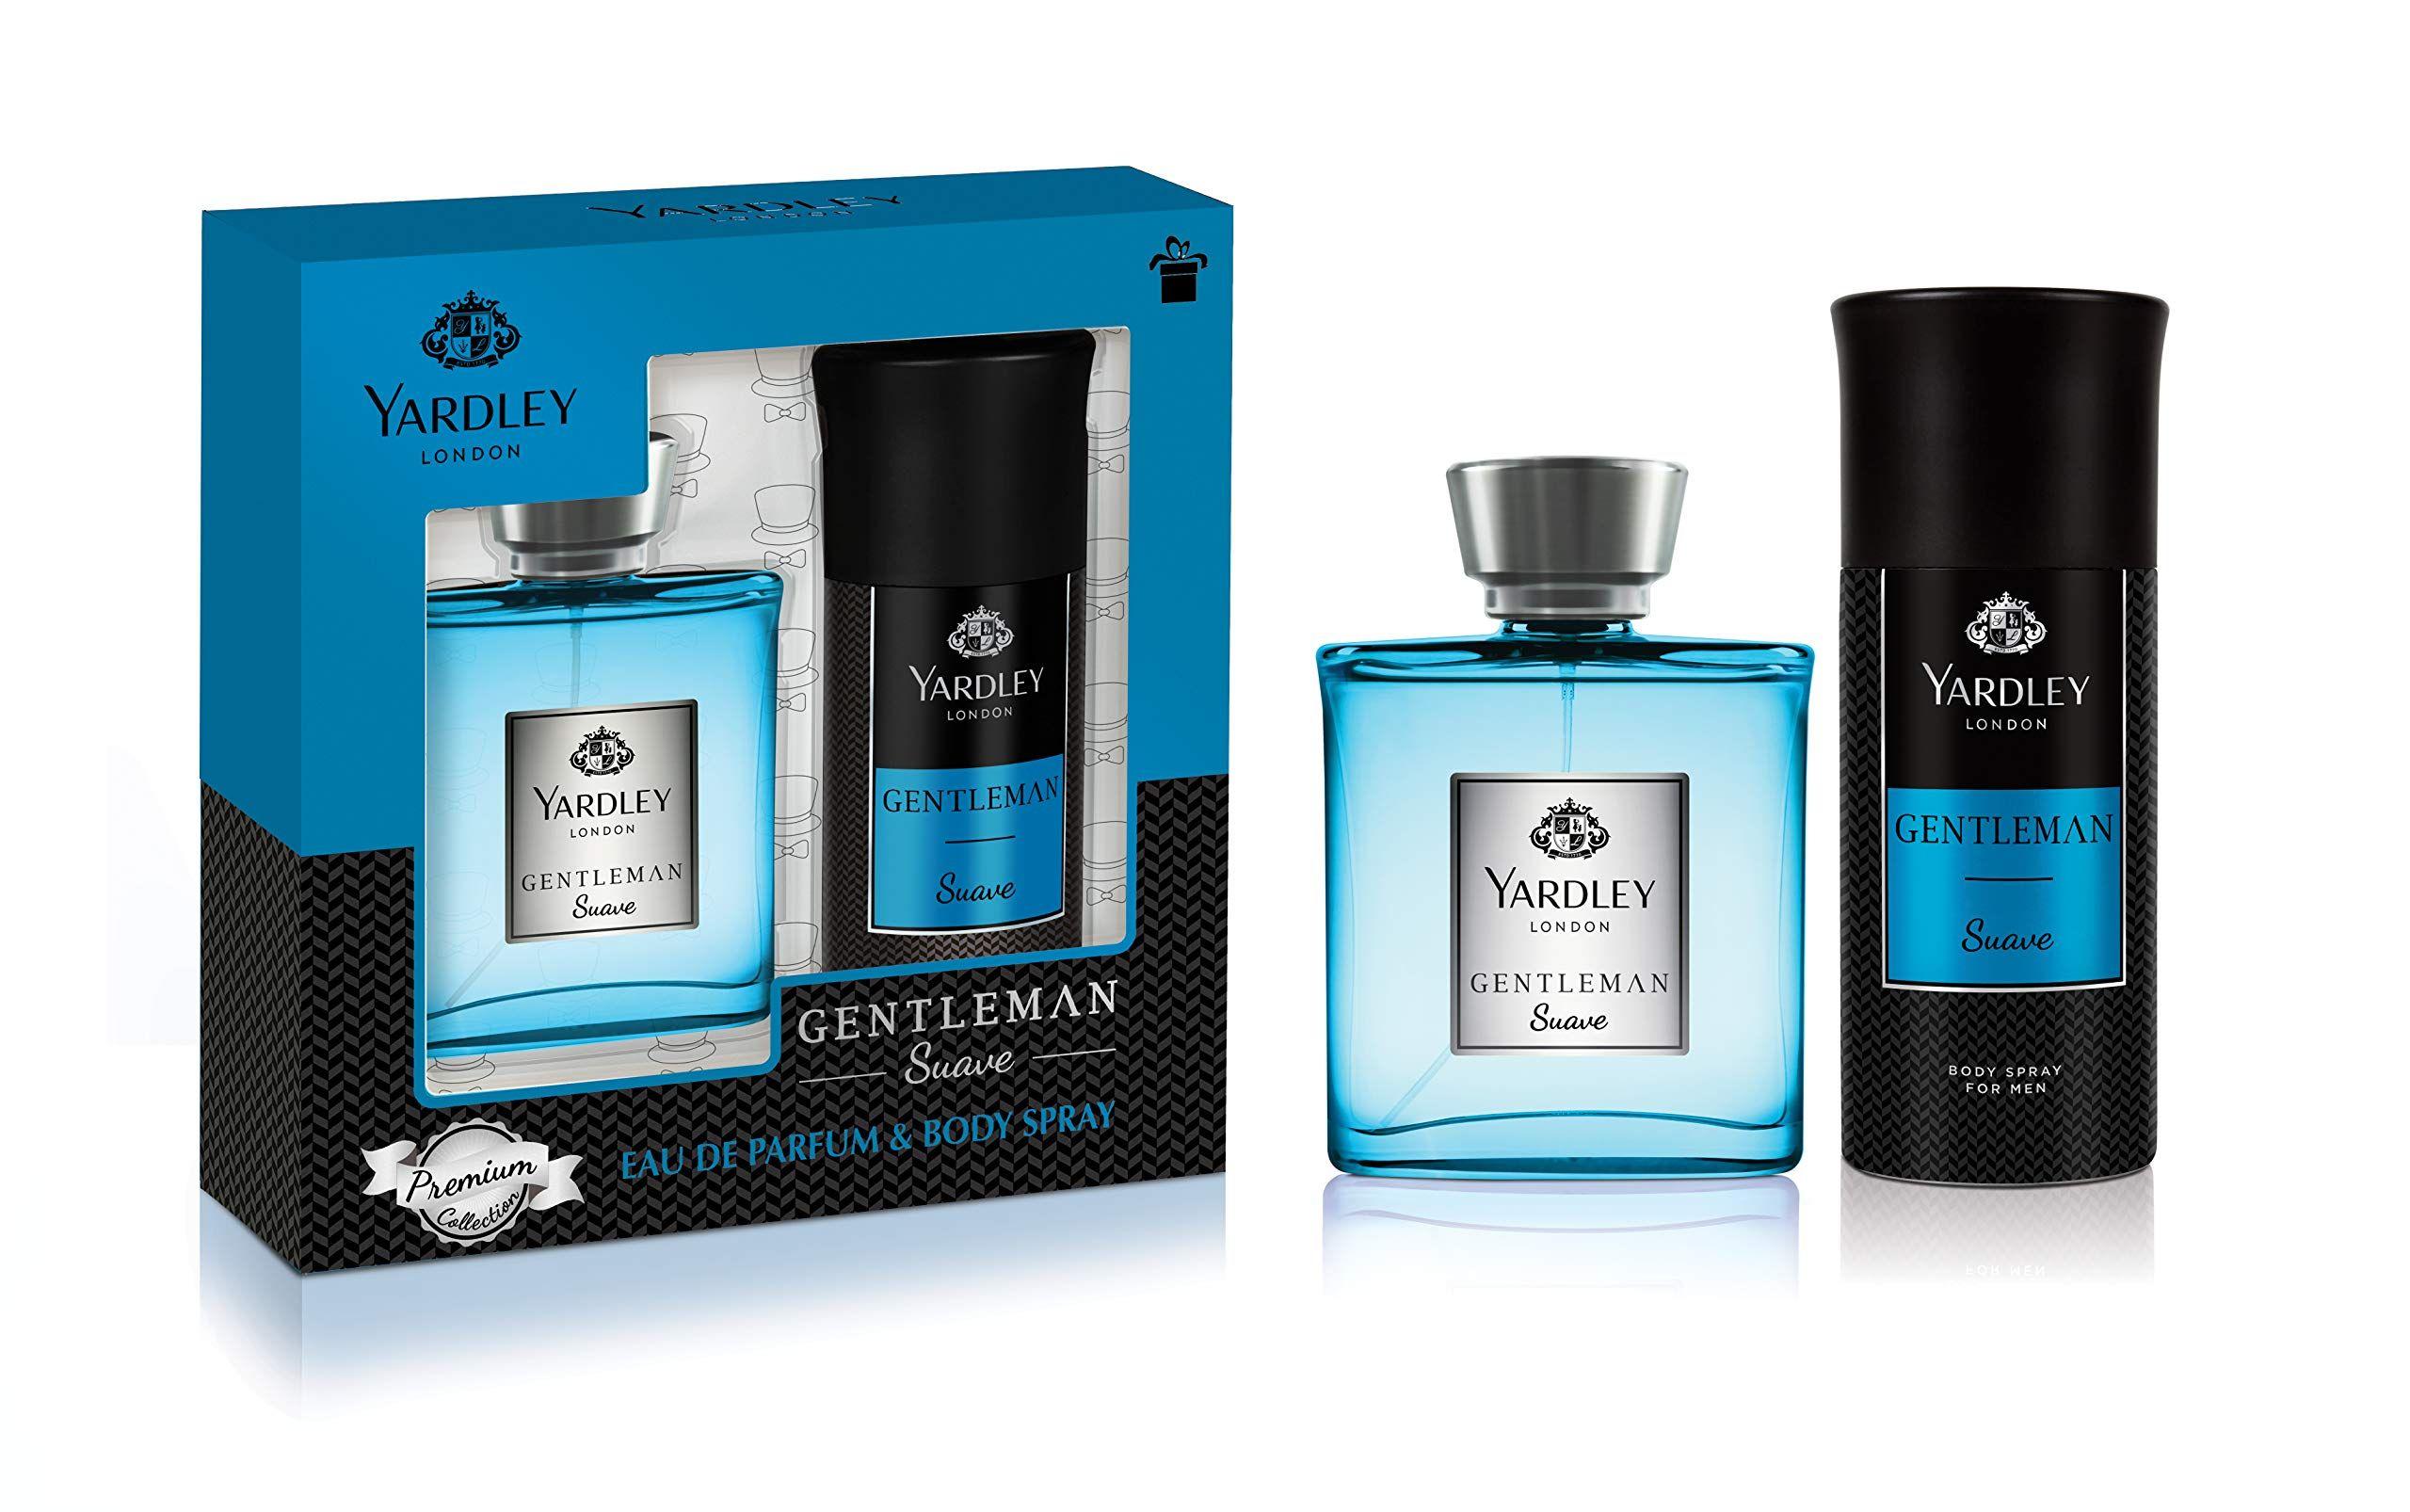 ياردلي جنتلمان سواف او دي بارفان 100 مل سبراي للجسم 150 مل تشحن بواسطة امازون امارات In 2020 Perfume Gift Sets Body Spray Perfume